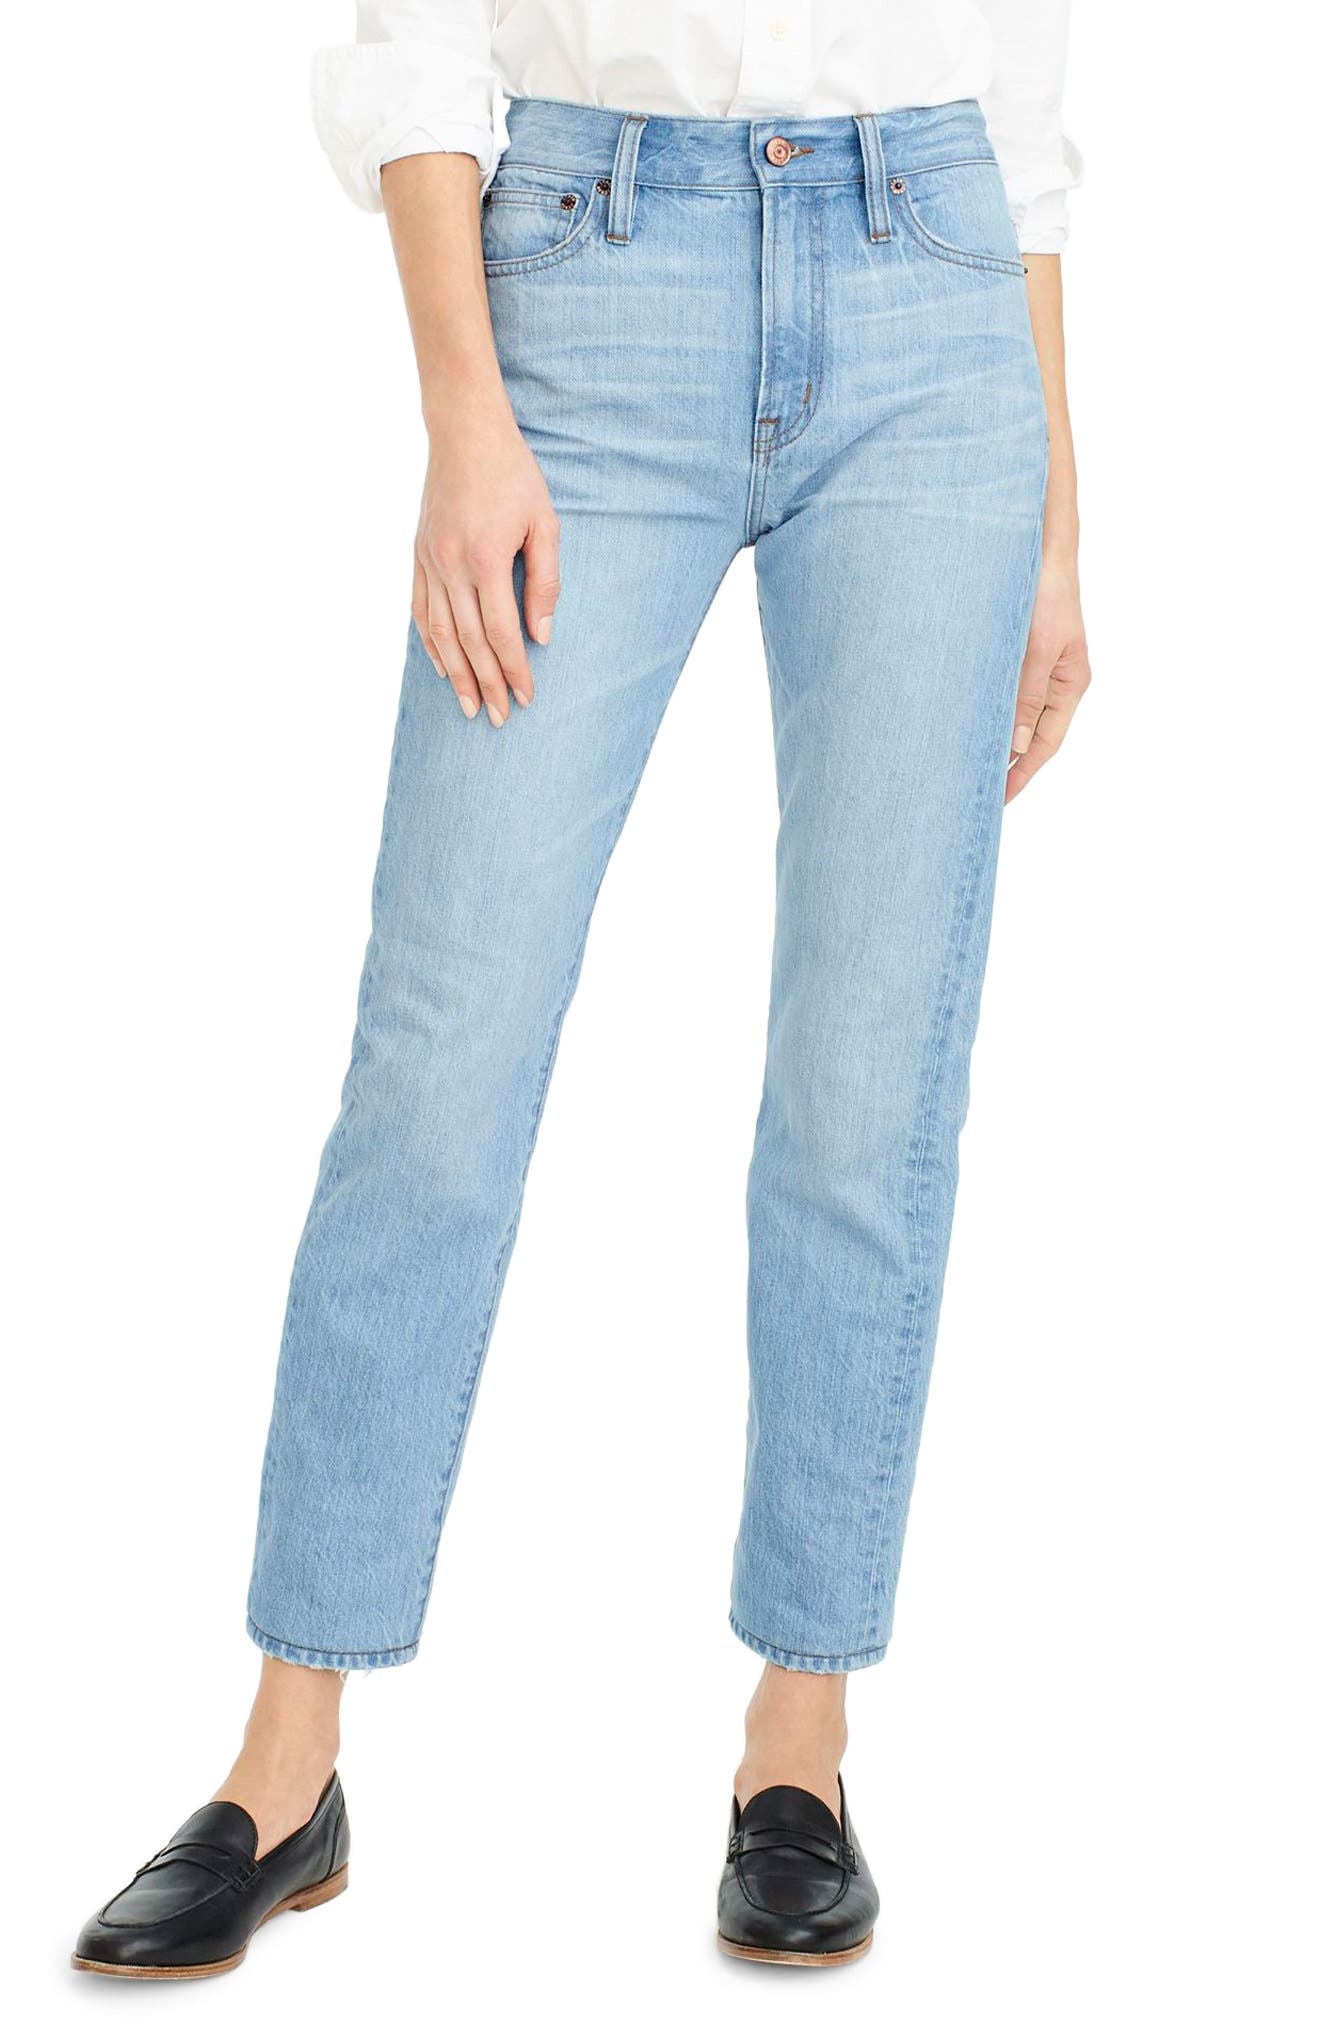 J.Crew Retro Big Idea Jeans (Regular & Petite) (Fern Wash)